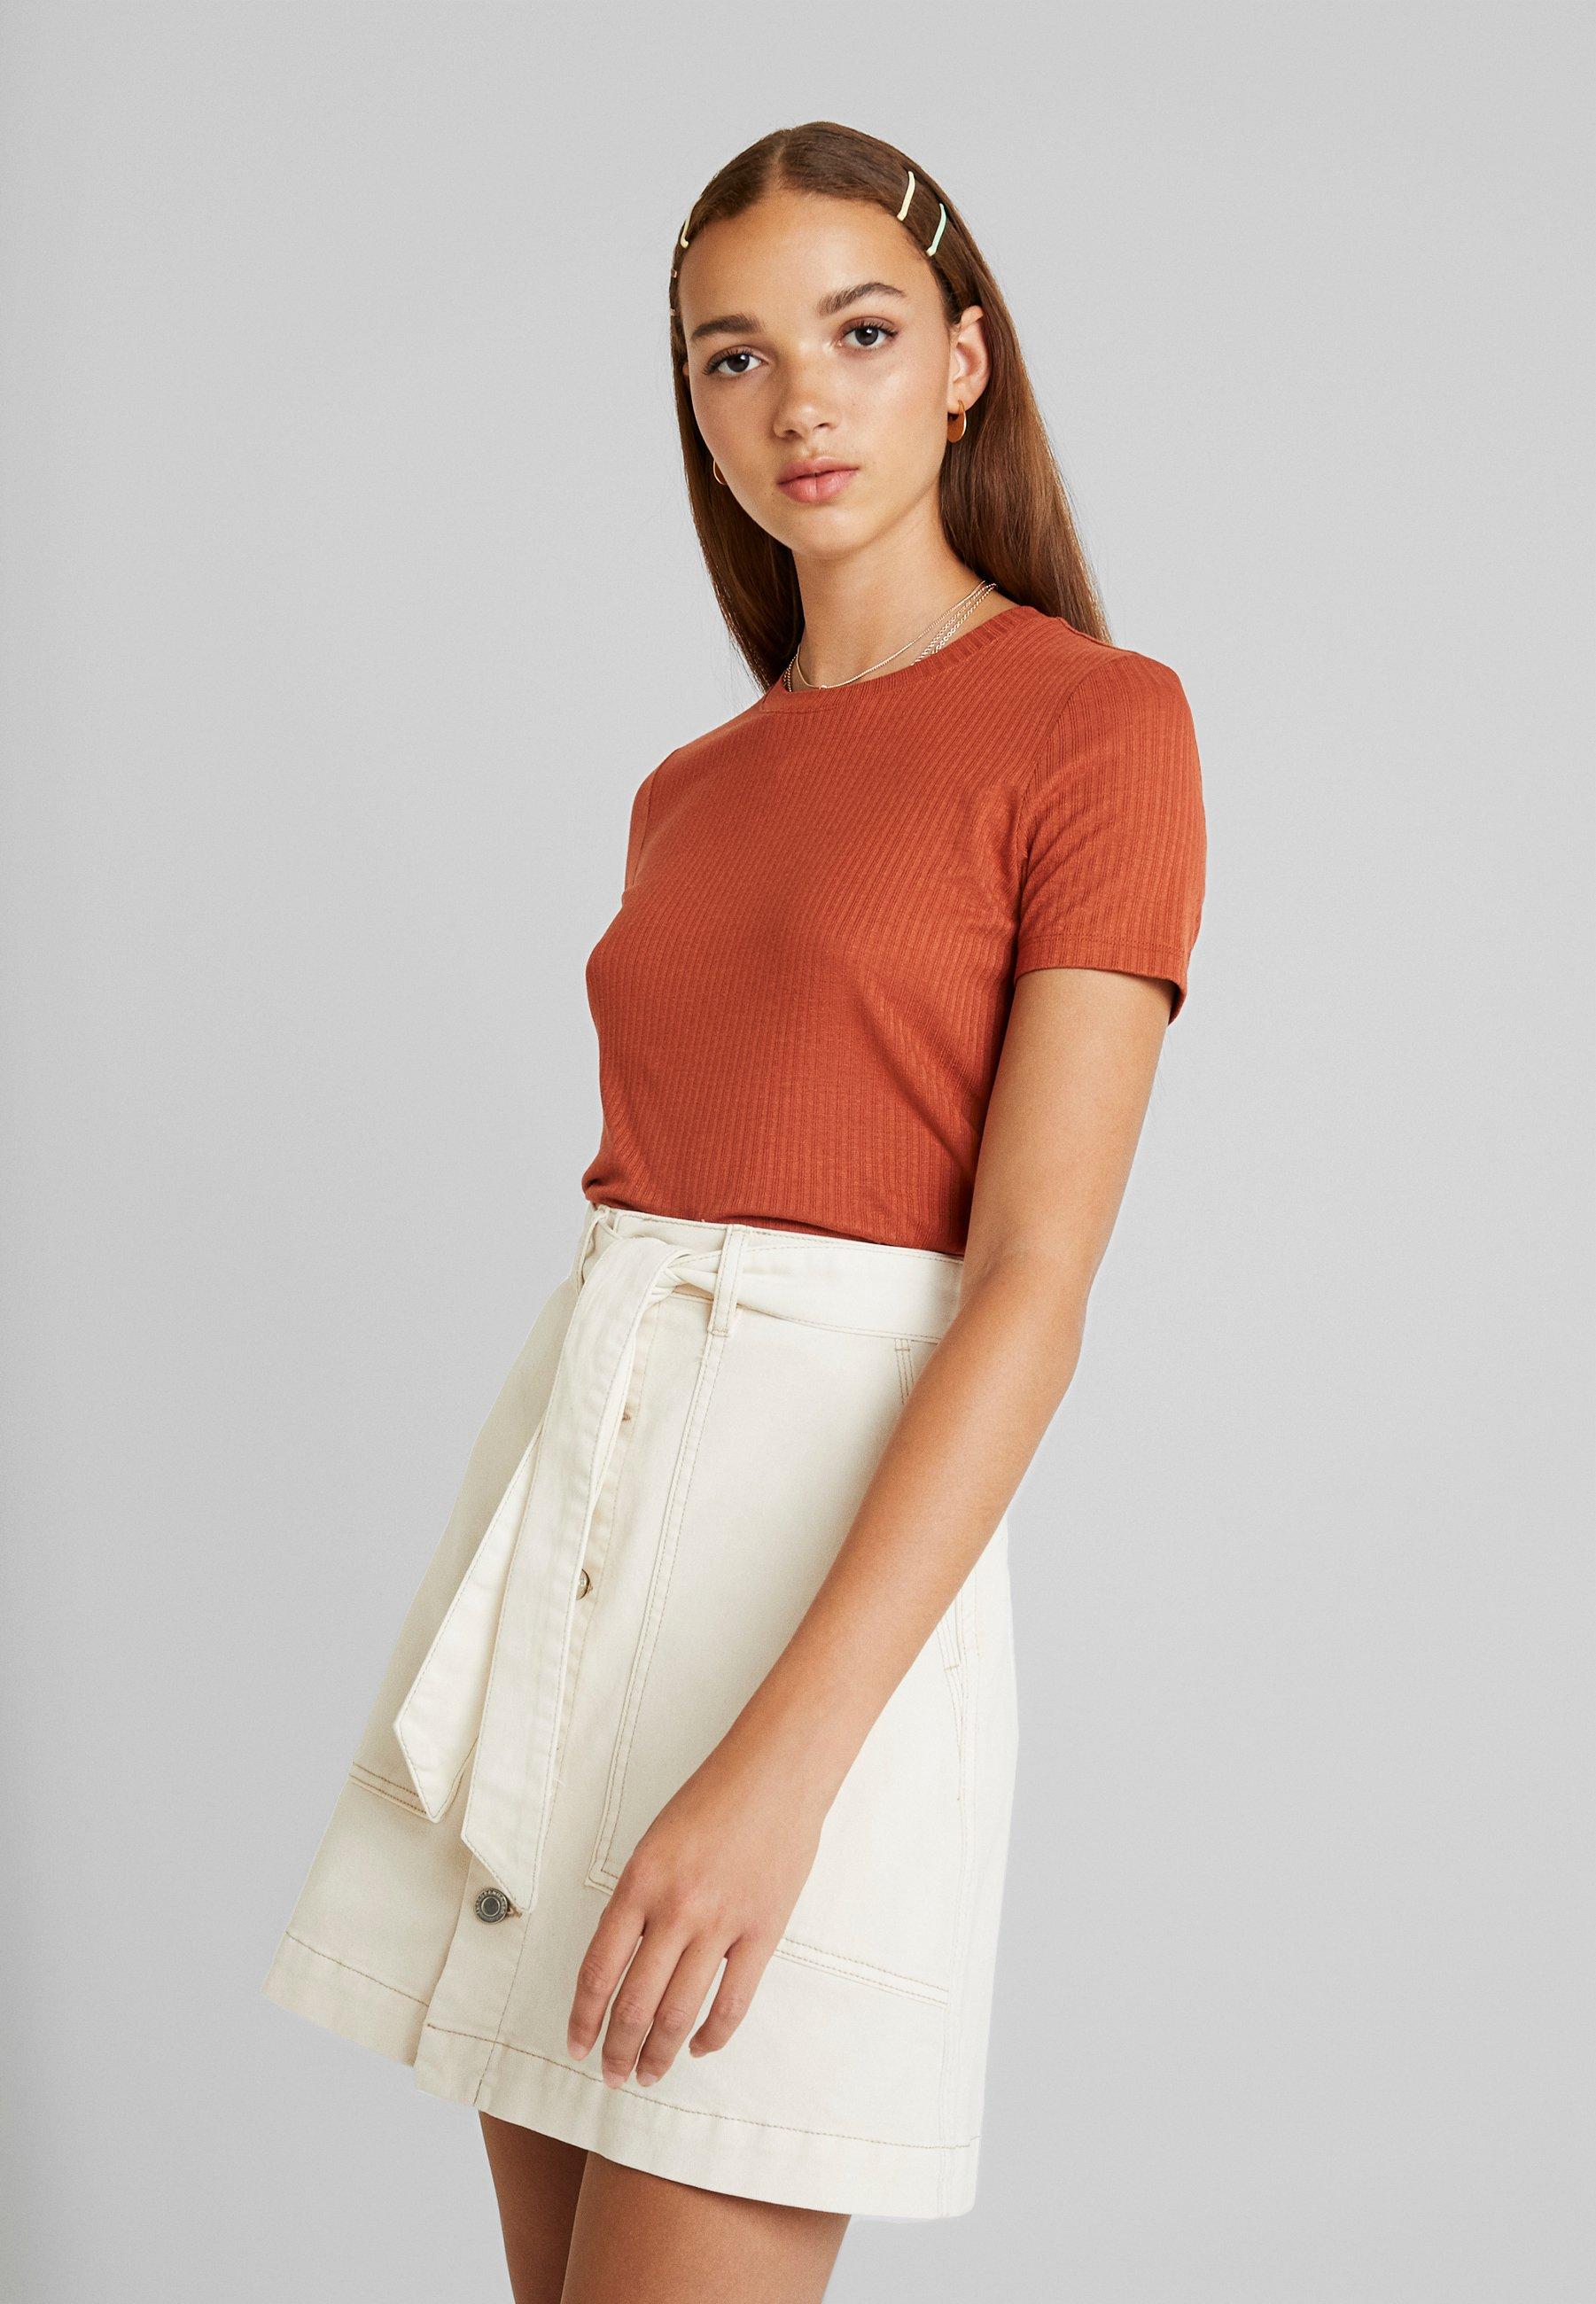 Orange LilianT shirt Monki Basique Dark Yf7yvIb6gm